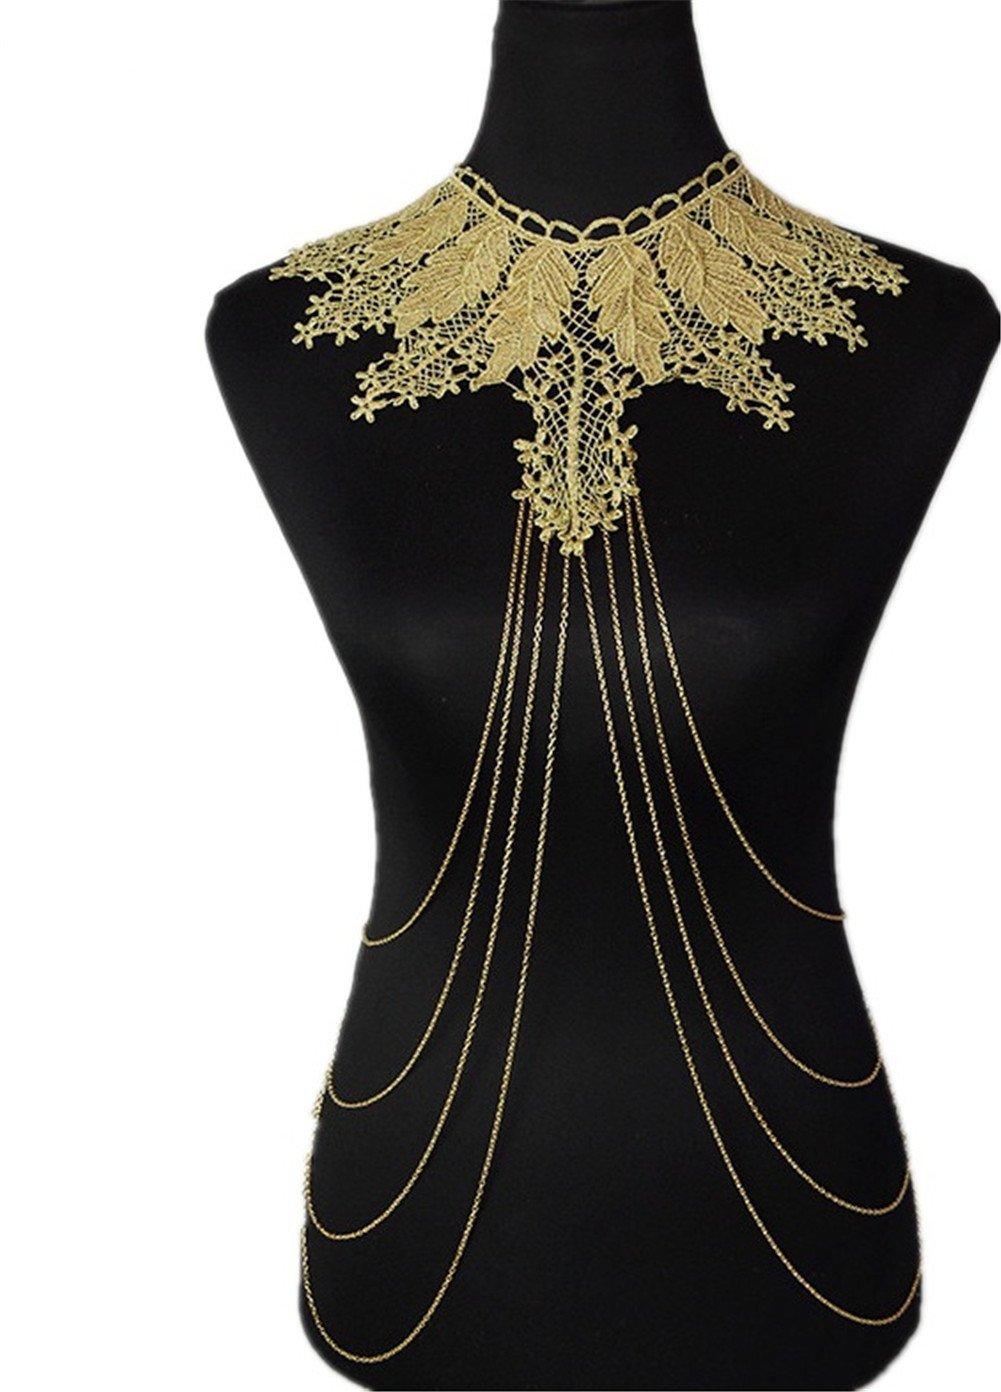 SIYWINA Gold Flower Leaves Lace Fine Chain Body Chain Bikini Summer New Arrival